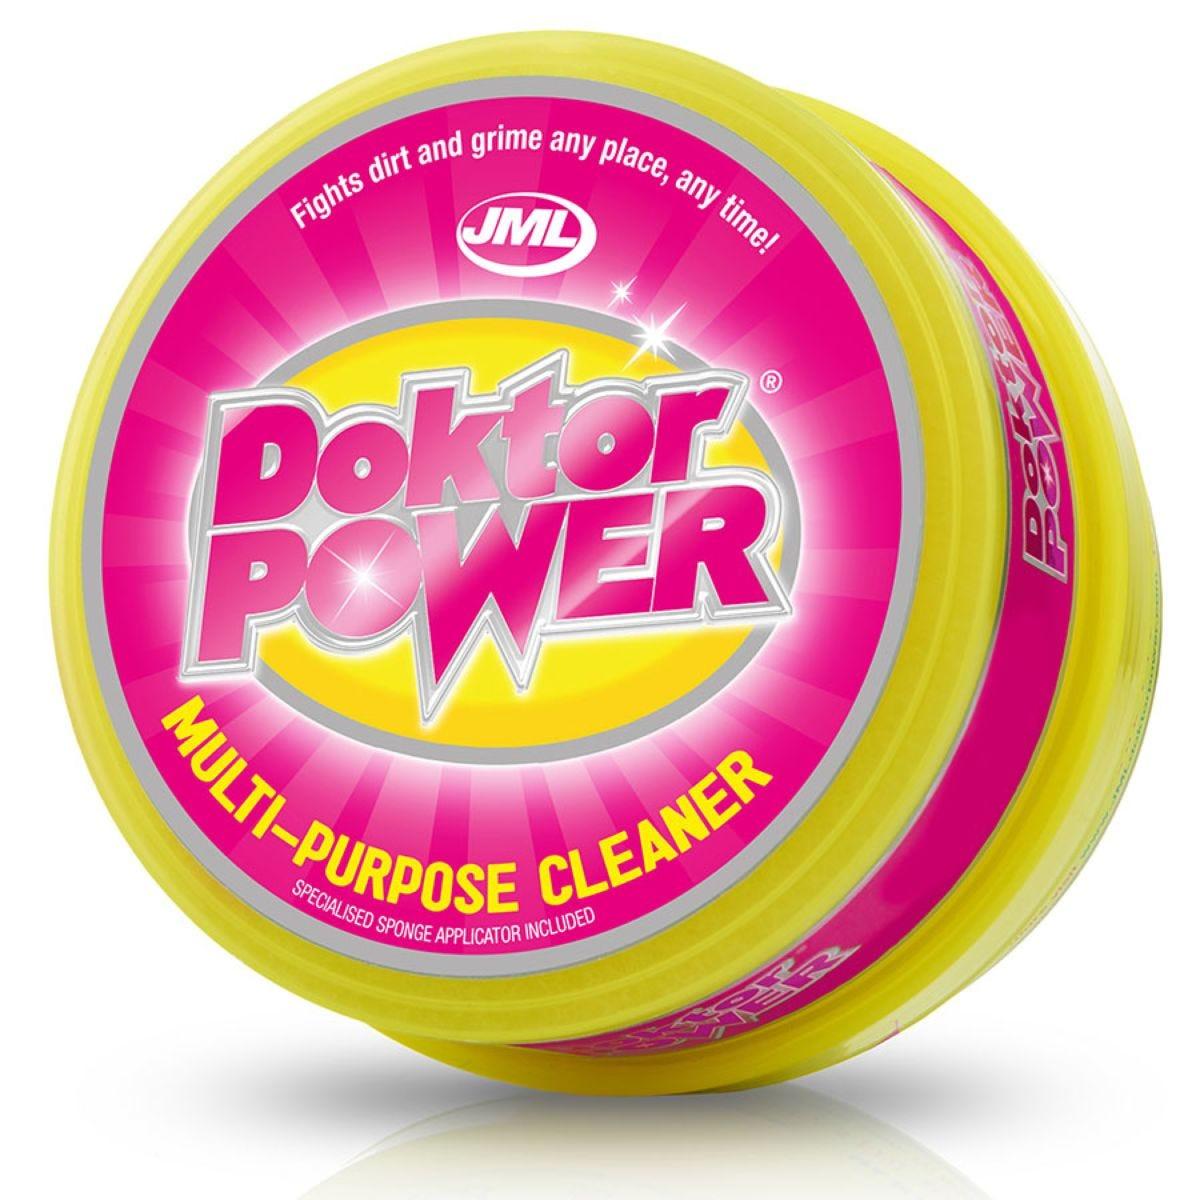 JML Doktor Power Foam Action Cleaner